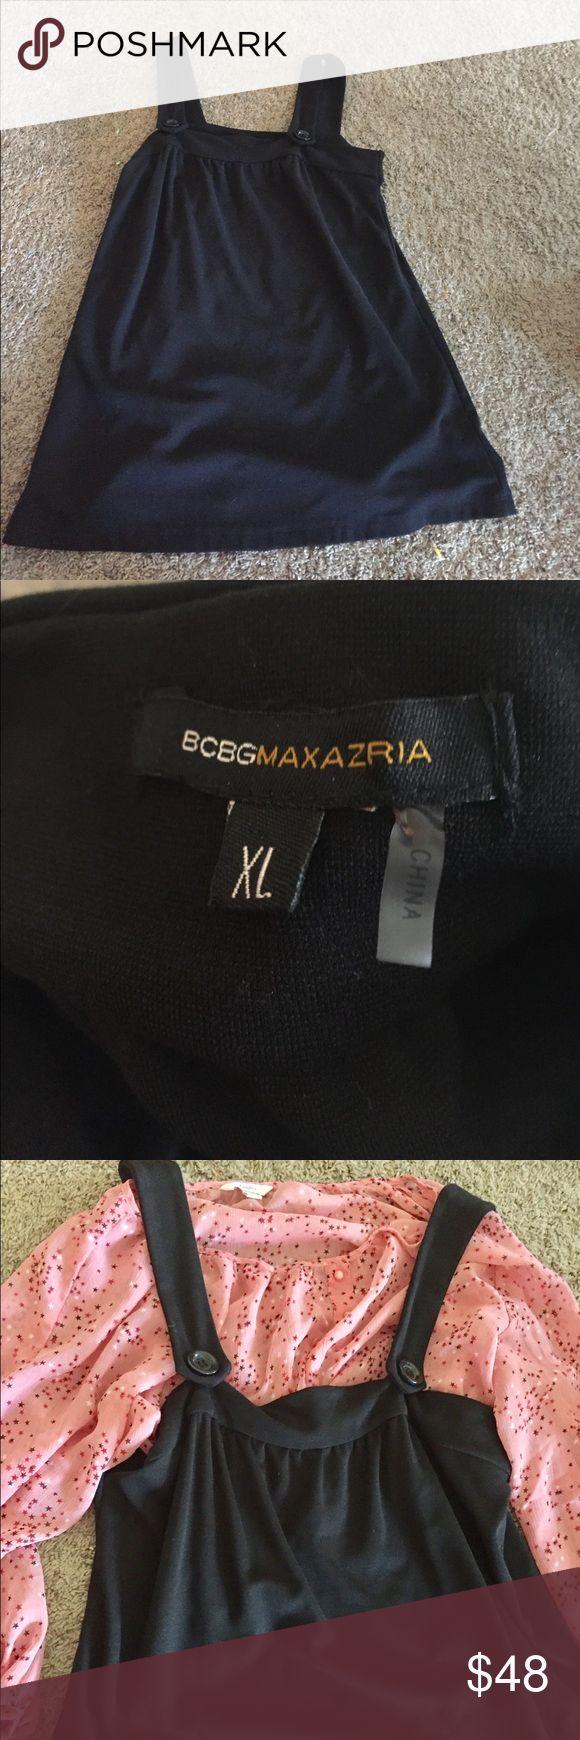 BCBGMAXAZRIA Jumper BCBGMAXAZRIA Black Jumper Dress very Cute!!! Super Versatile Gr8 Shape! BCBGMaxAzria Dresses Midi